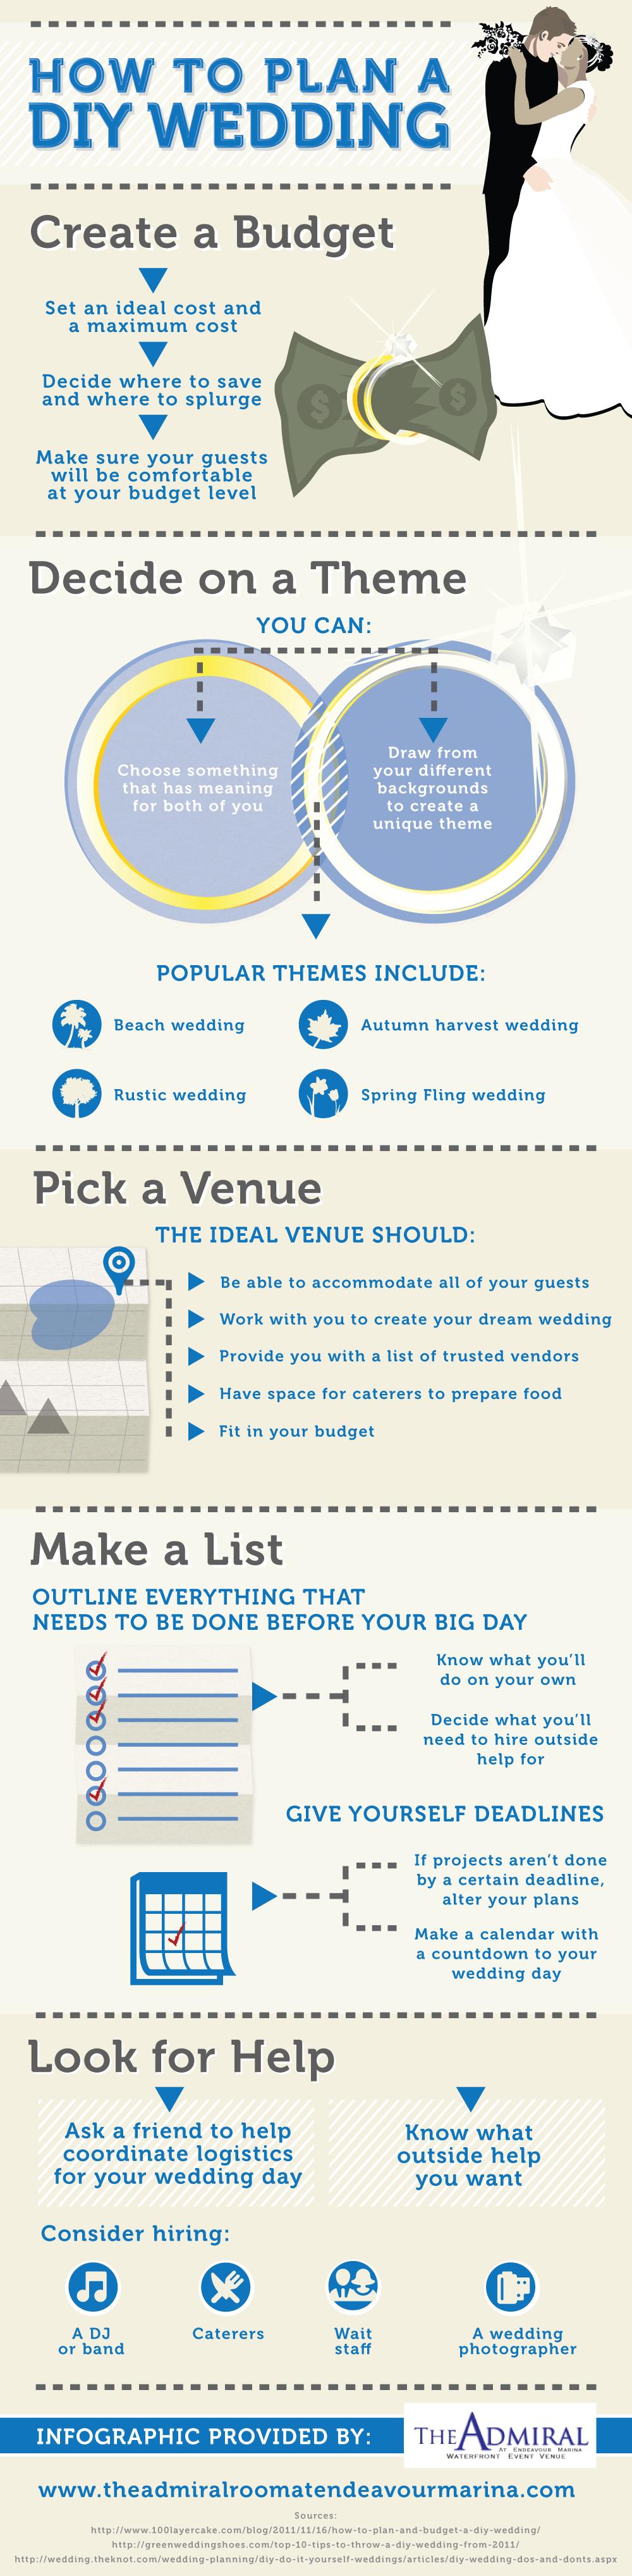 How to plan a diy wedding wedding pinterest diy wedding how to plan a diy wedding solutioingenieria Gallery